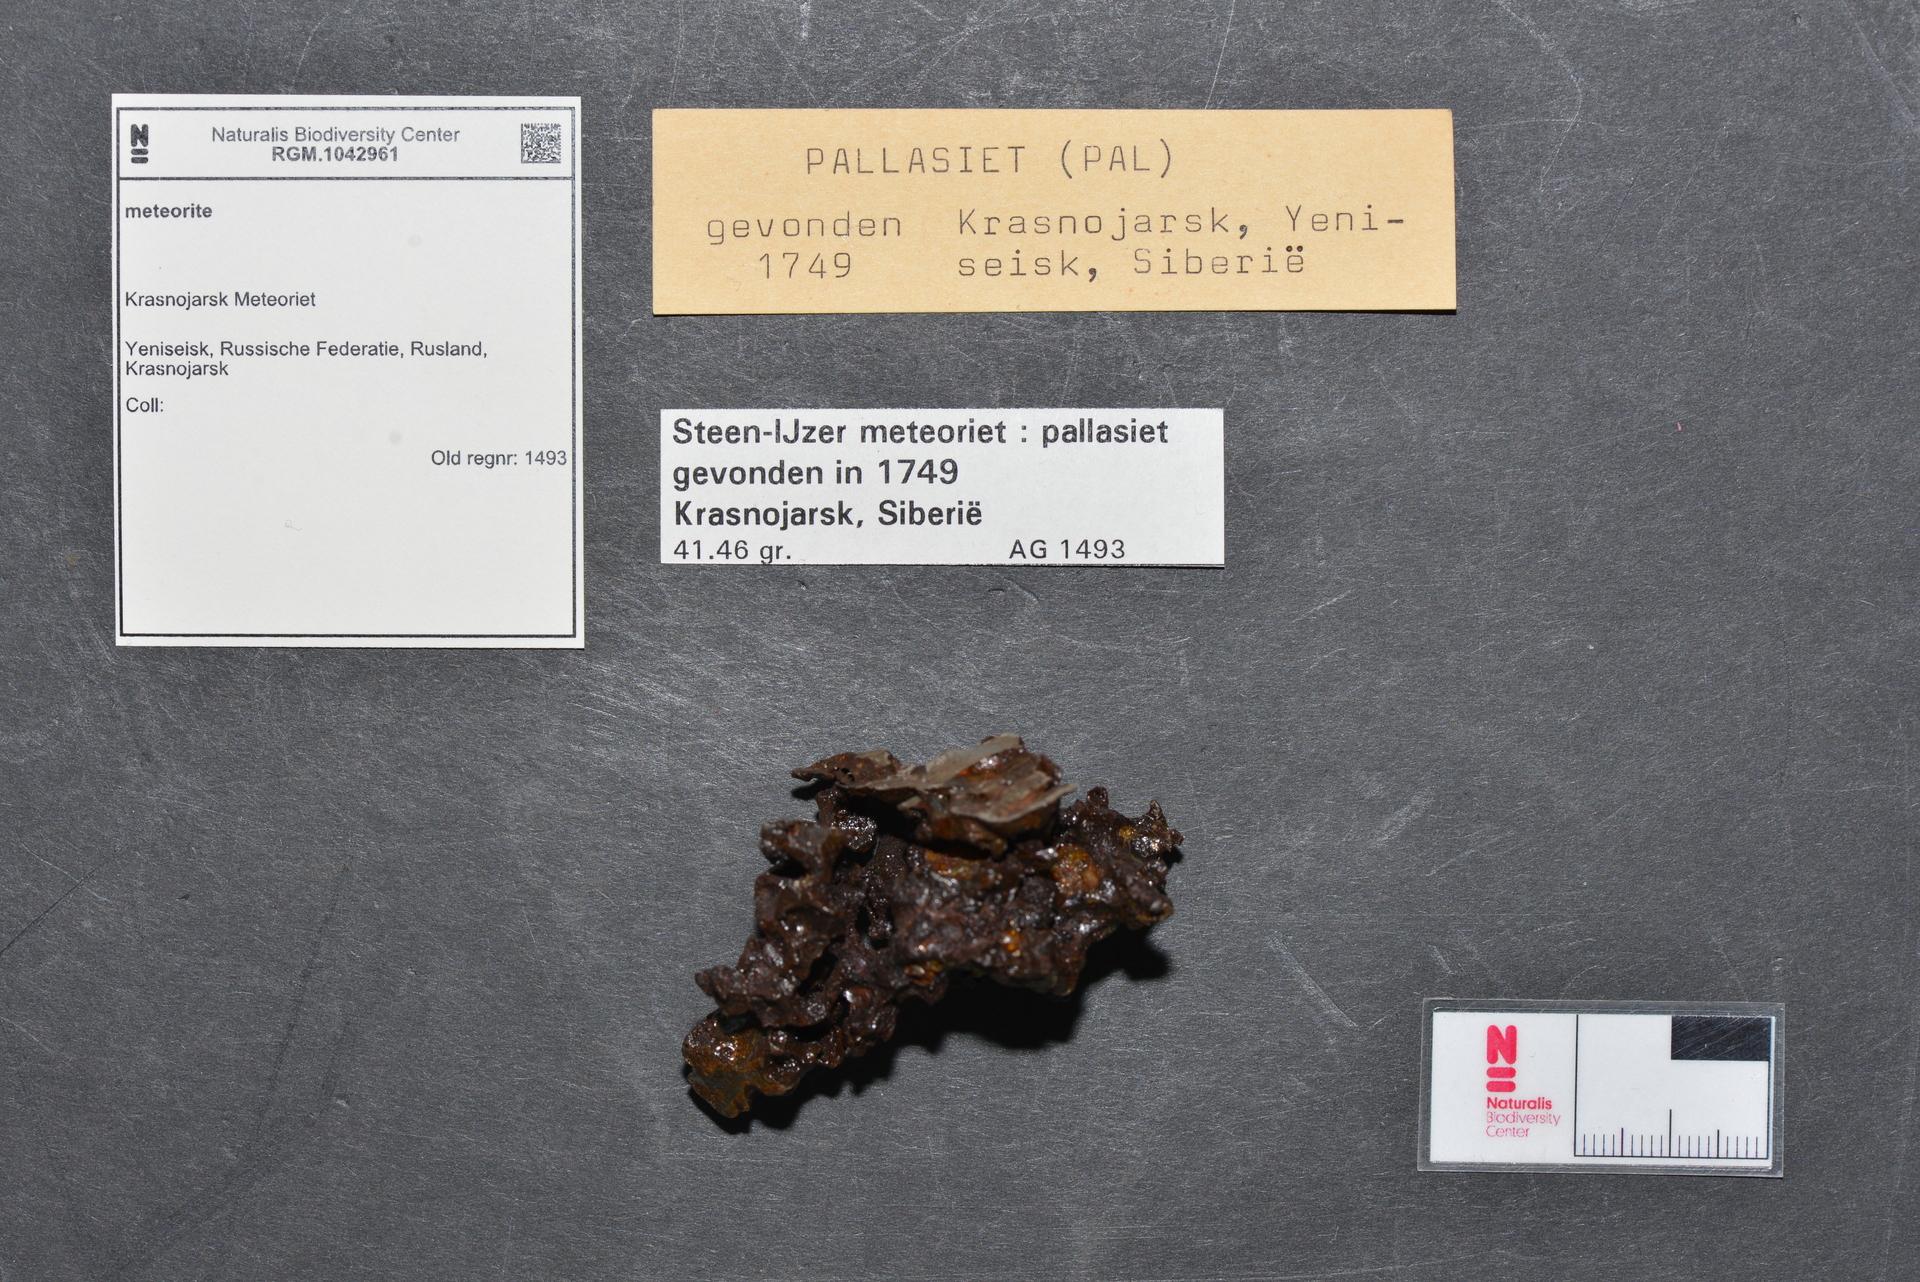 RGM.1042961 | Pallasite, PMG-an